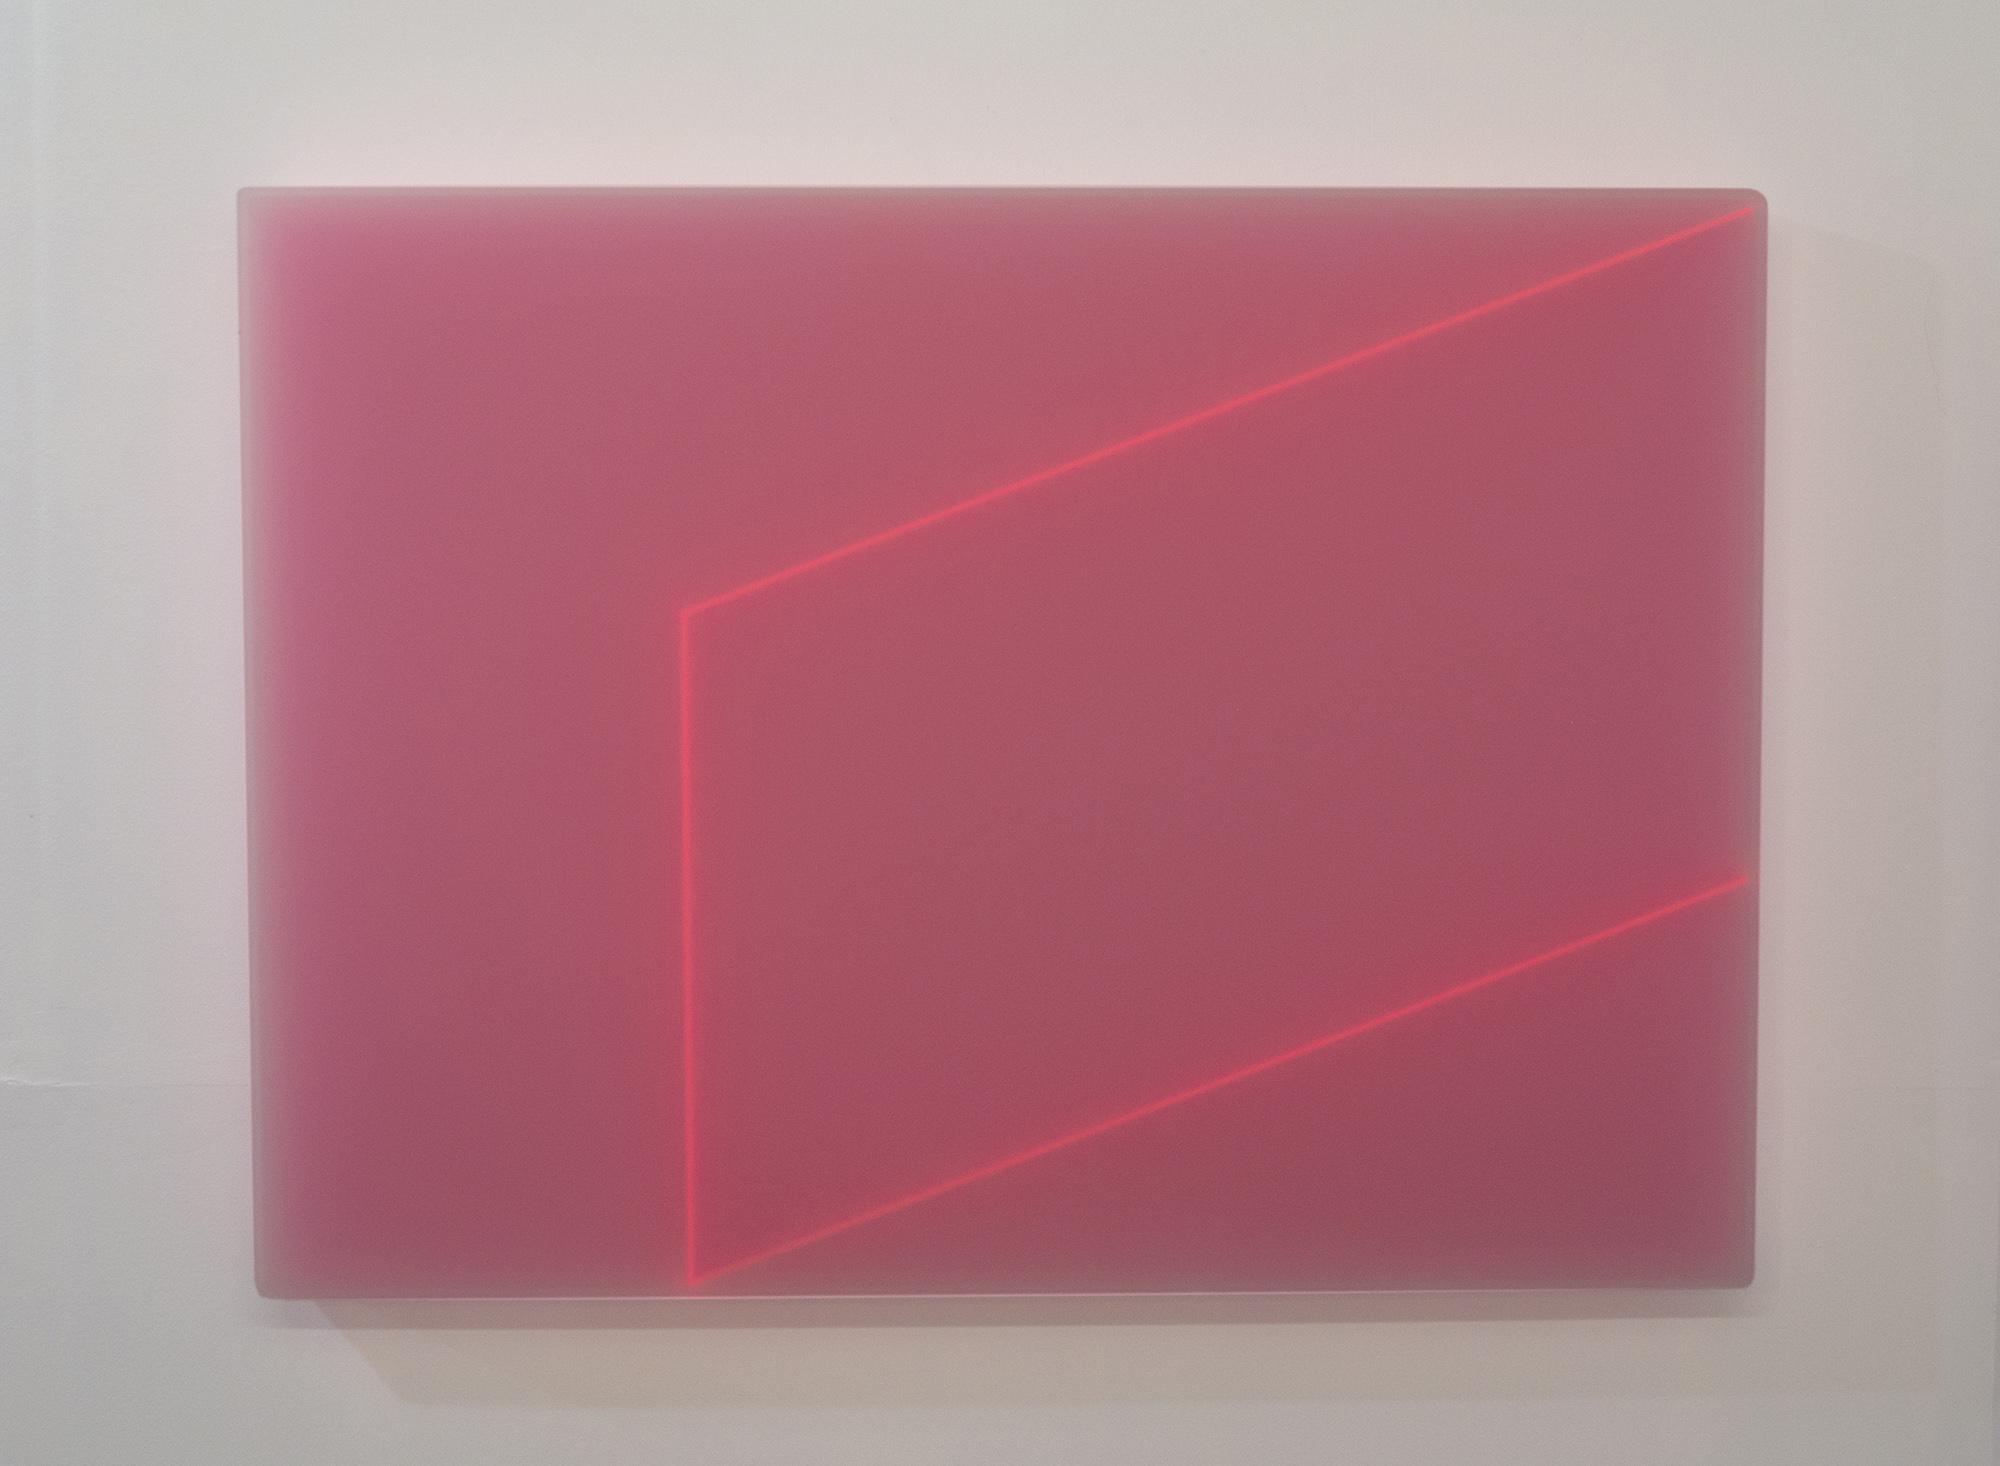 Karyn Taylor, Euclid's Transit, 2017, cast acrylic, 63 x 86 x 65mm.jpg